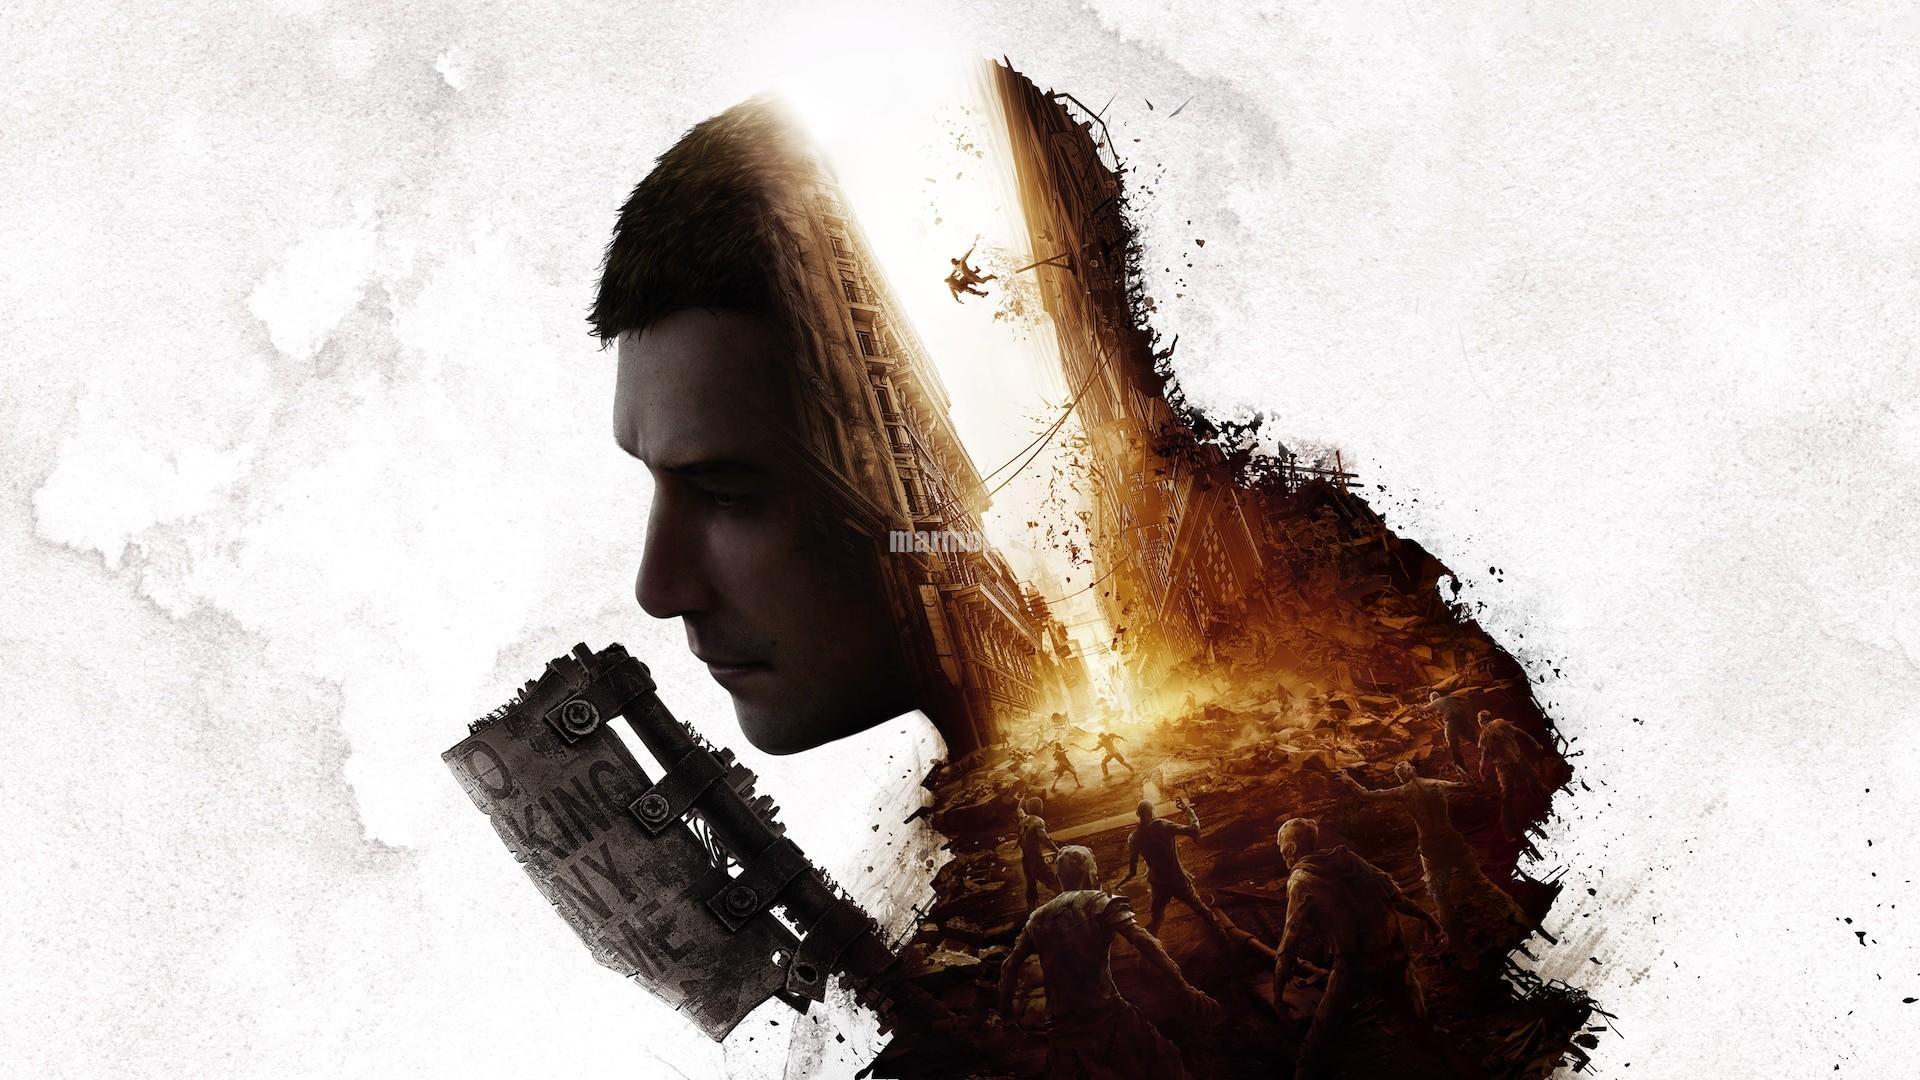 Скриншот из игры Dying Light 2 Stay Human